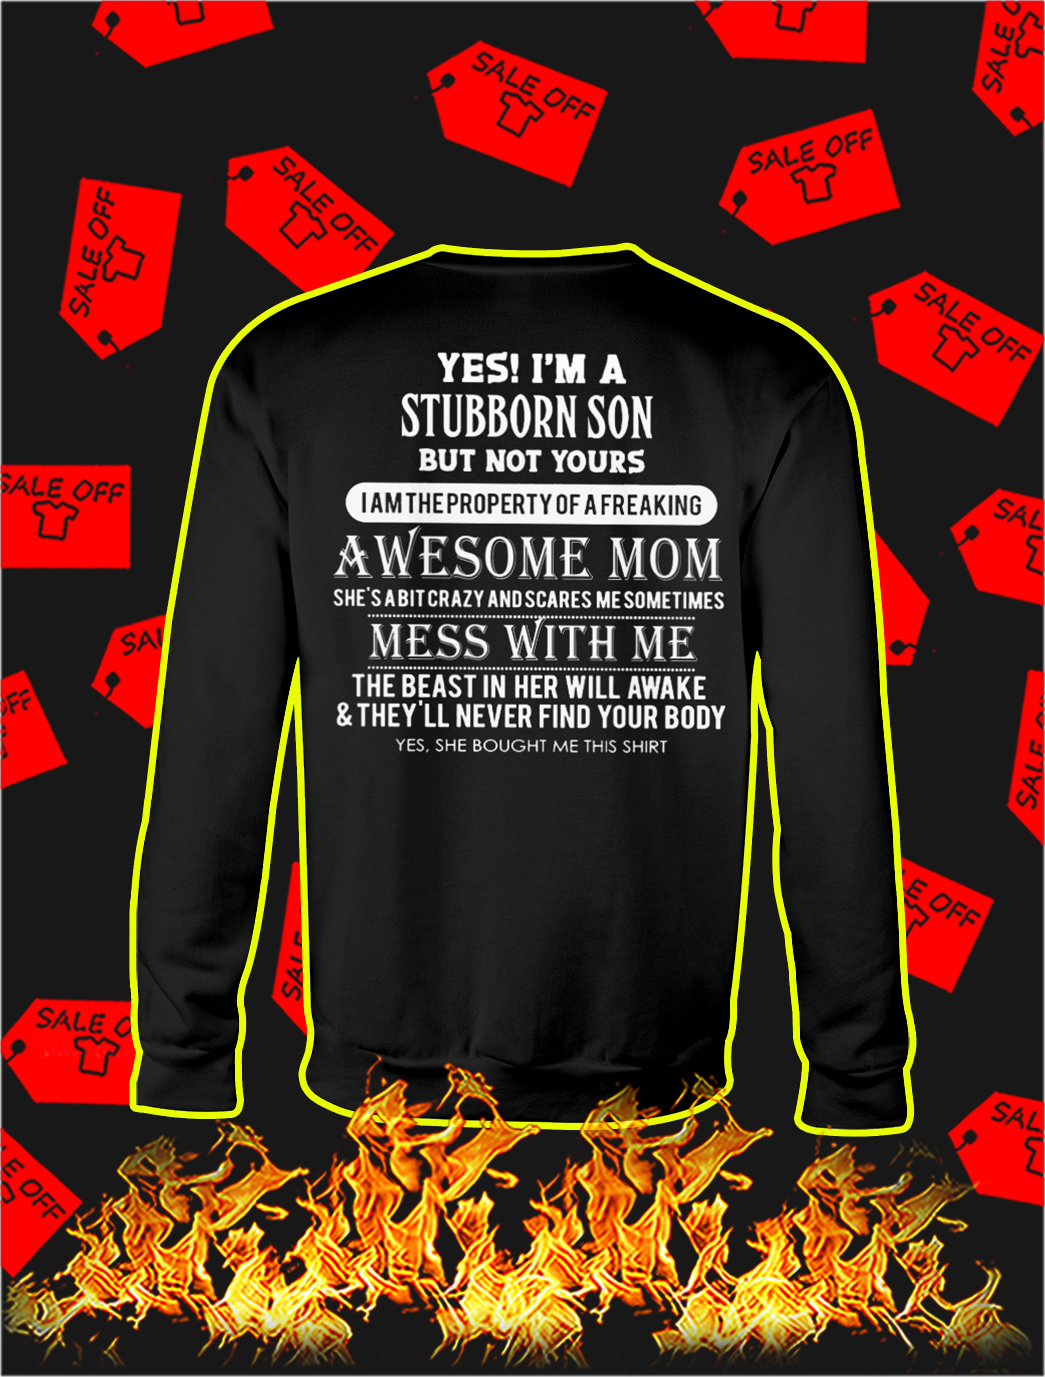 Yes I'm A Stubborn Son sweatshirt